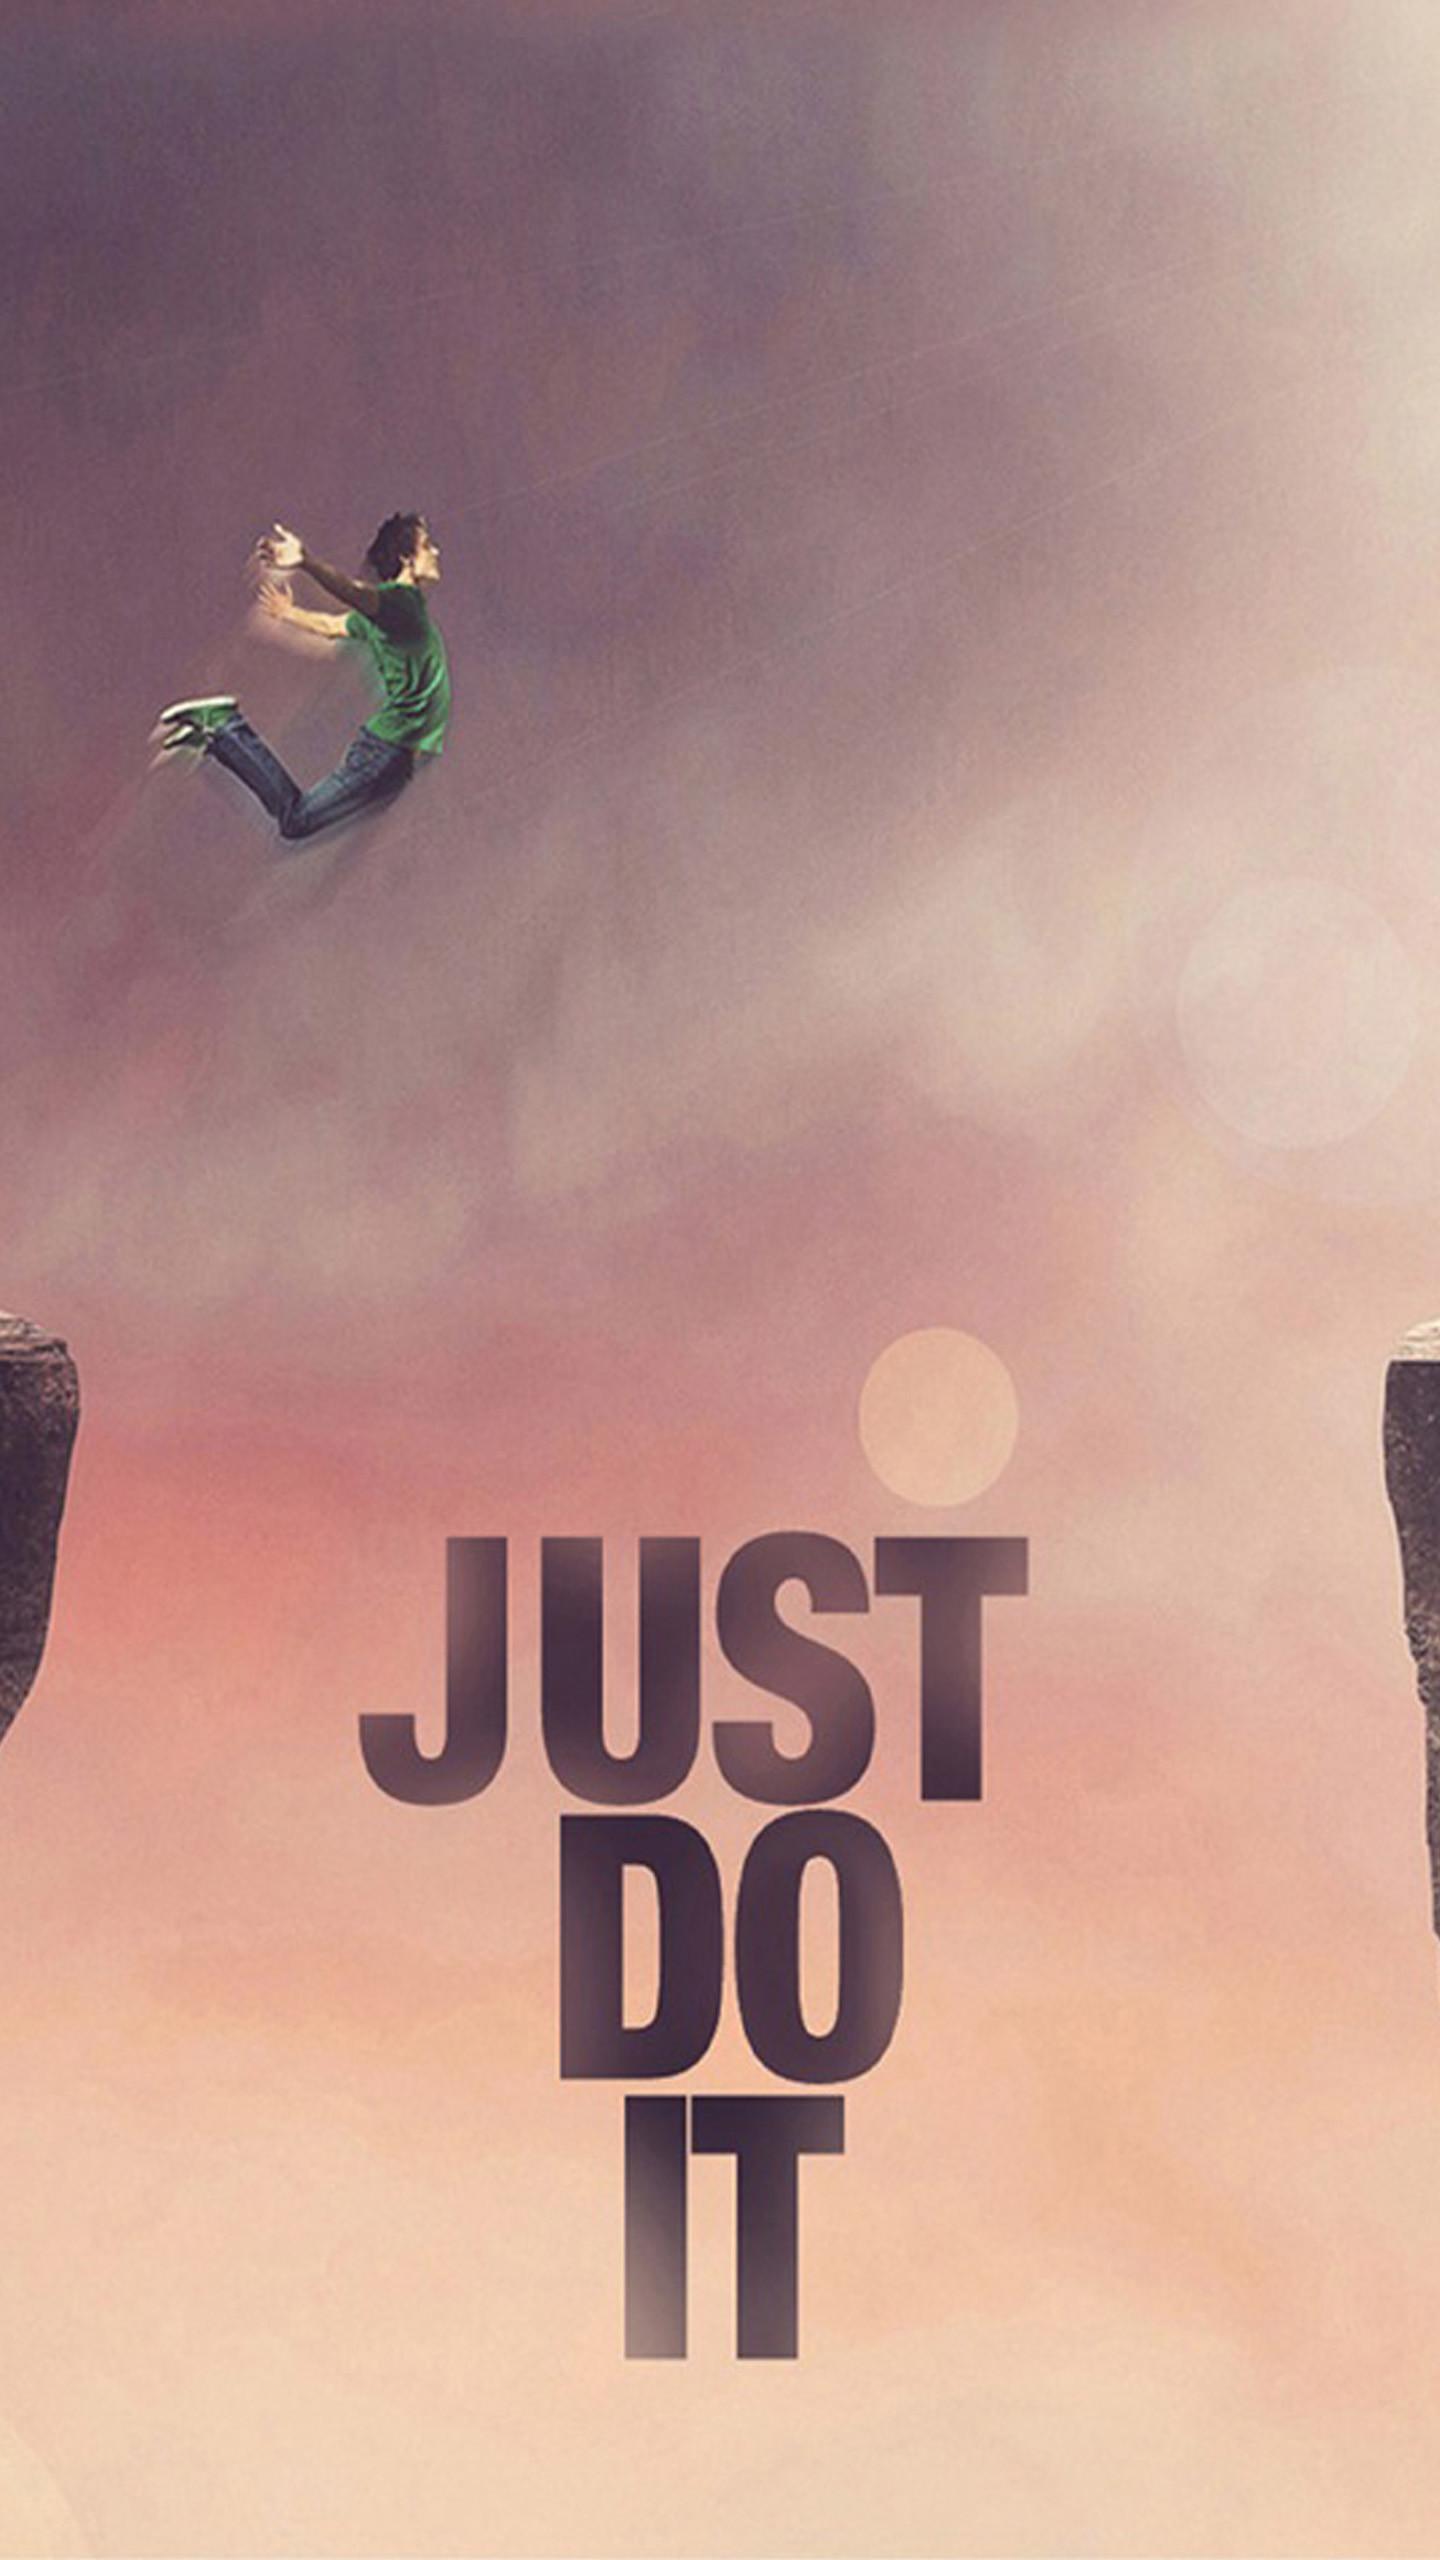 Just Do It Wallpaper – Wallpaper Free Download